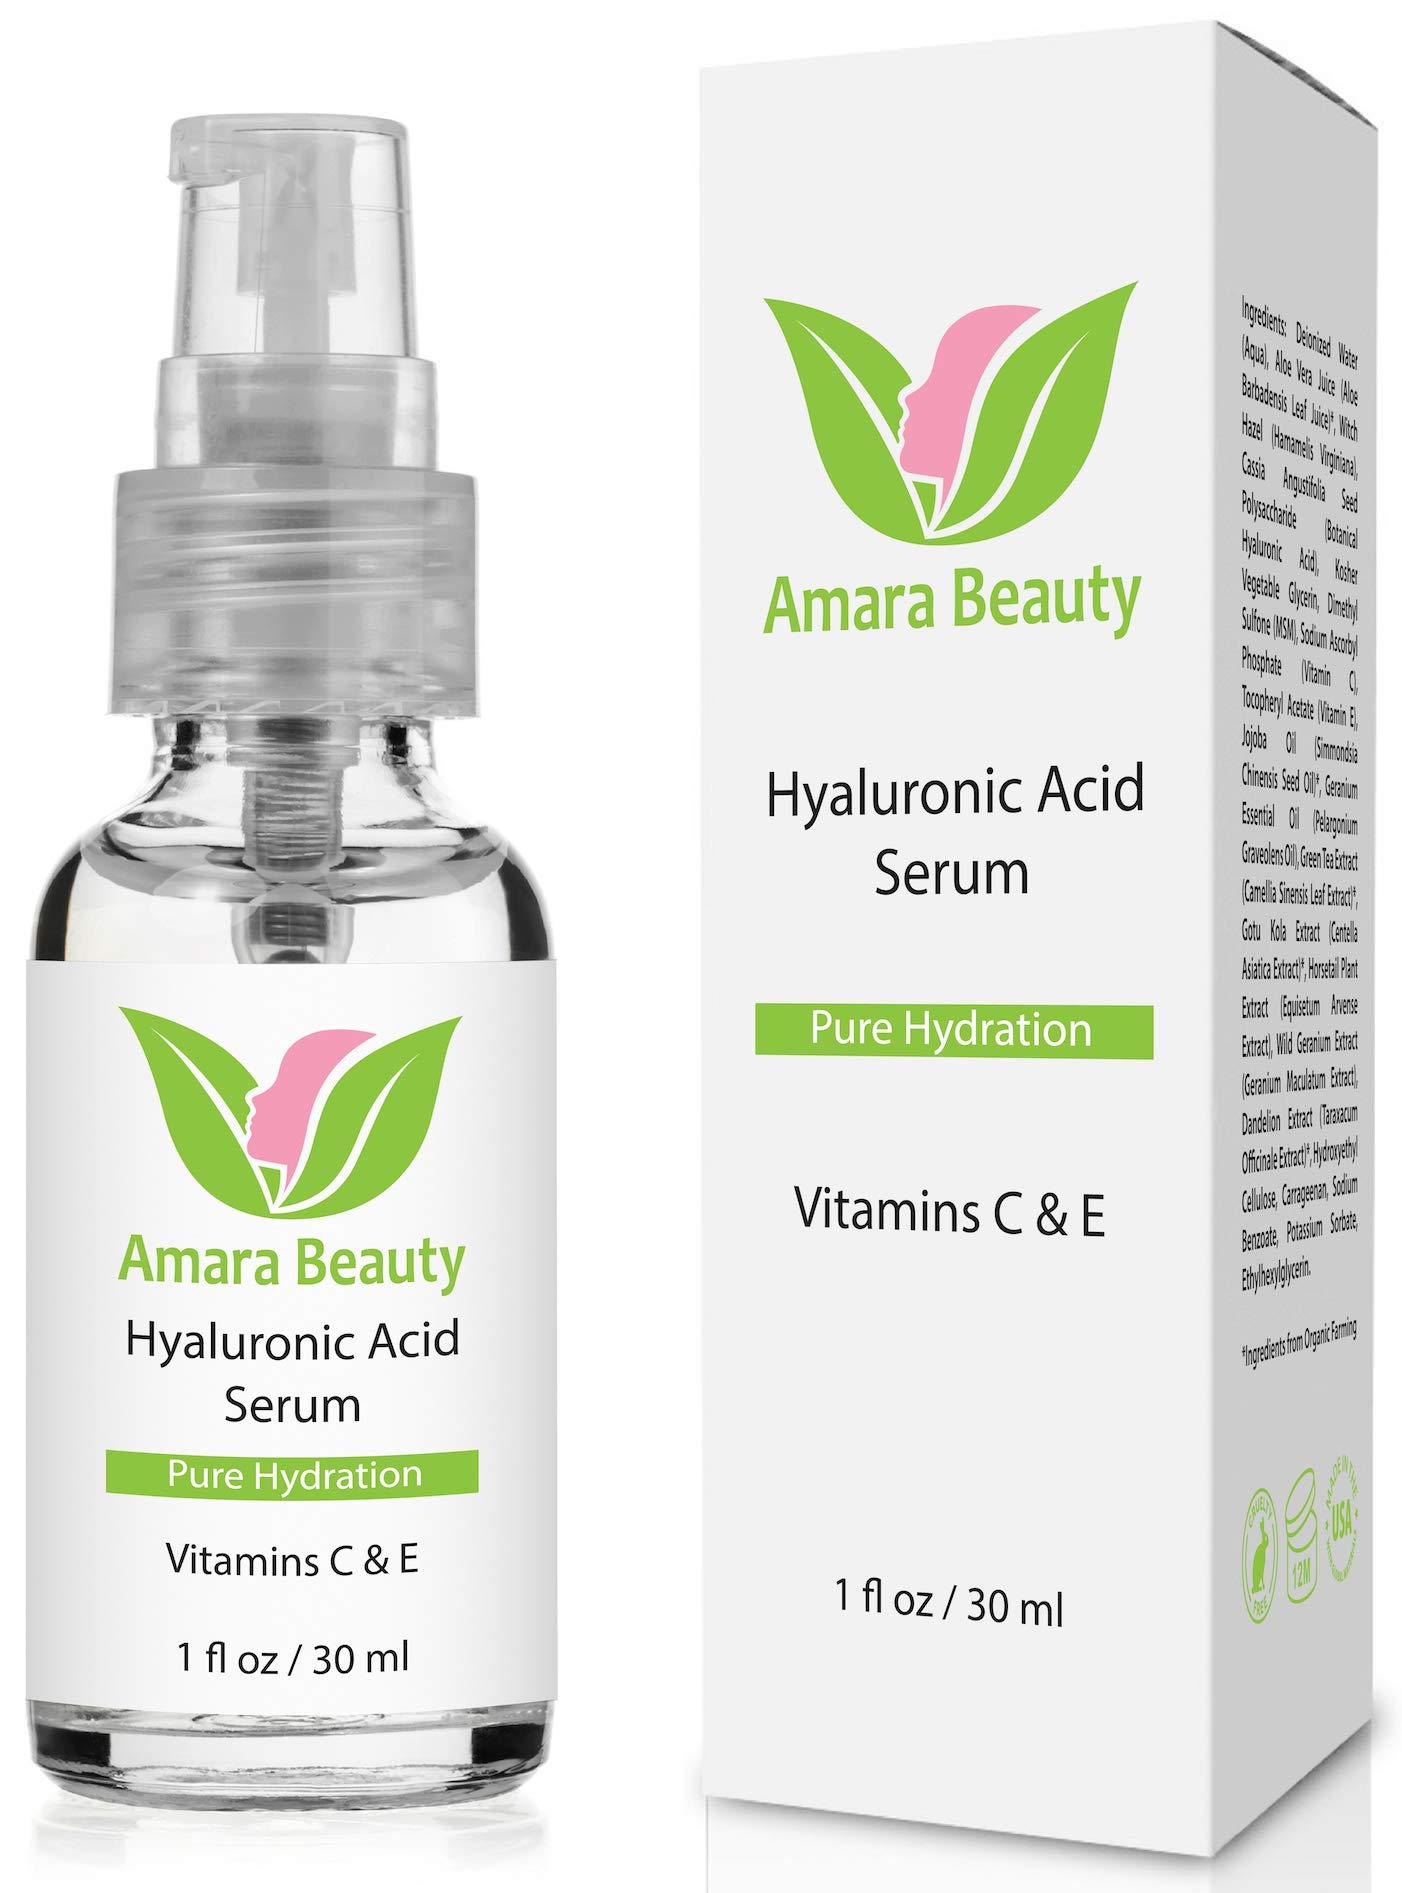 Hyaluronic Acid Serum for Skin with Vitamin C & E, 1 fl. oz.